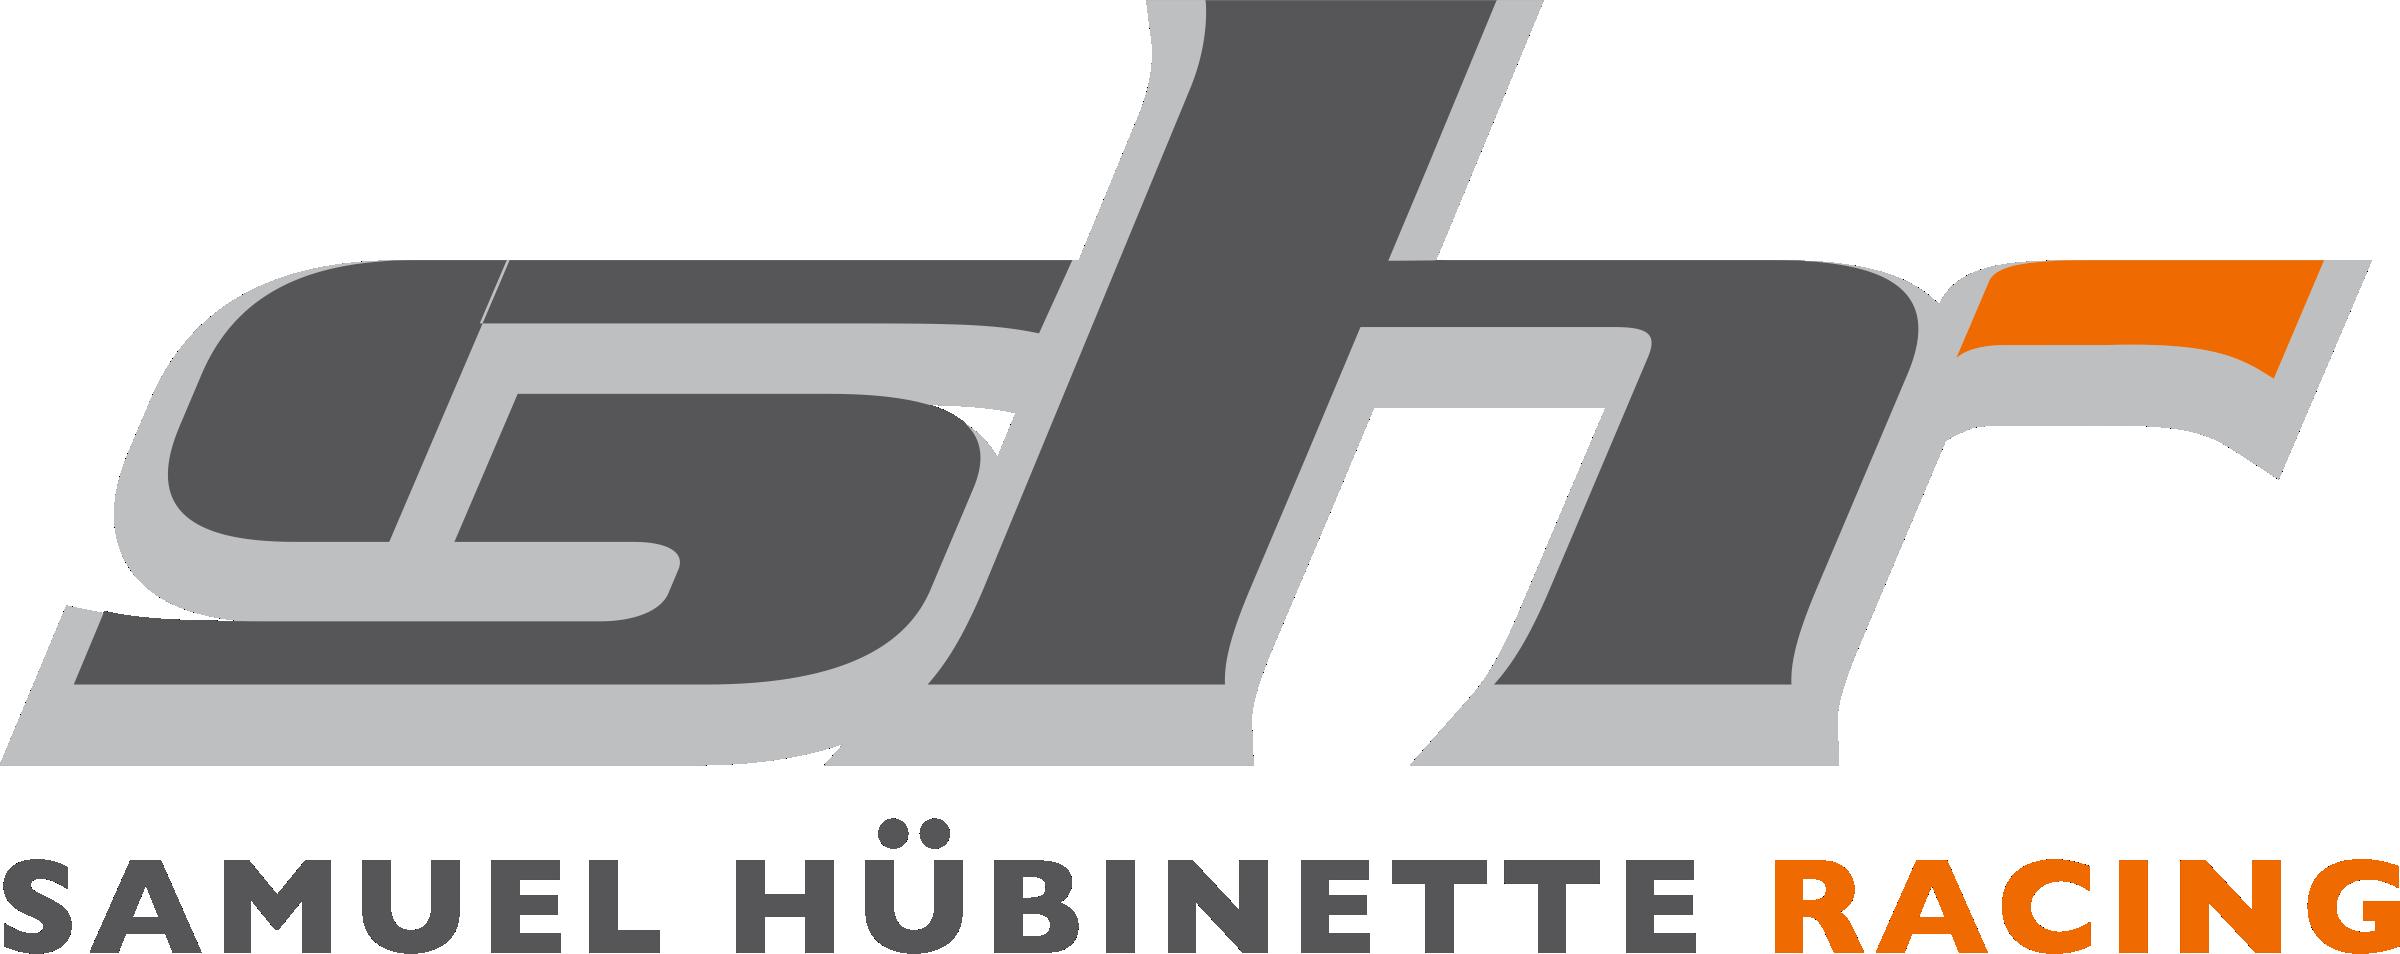 Samuel Hubinette Racing